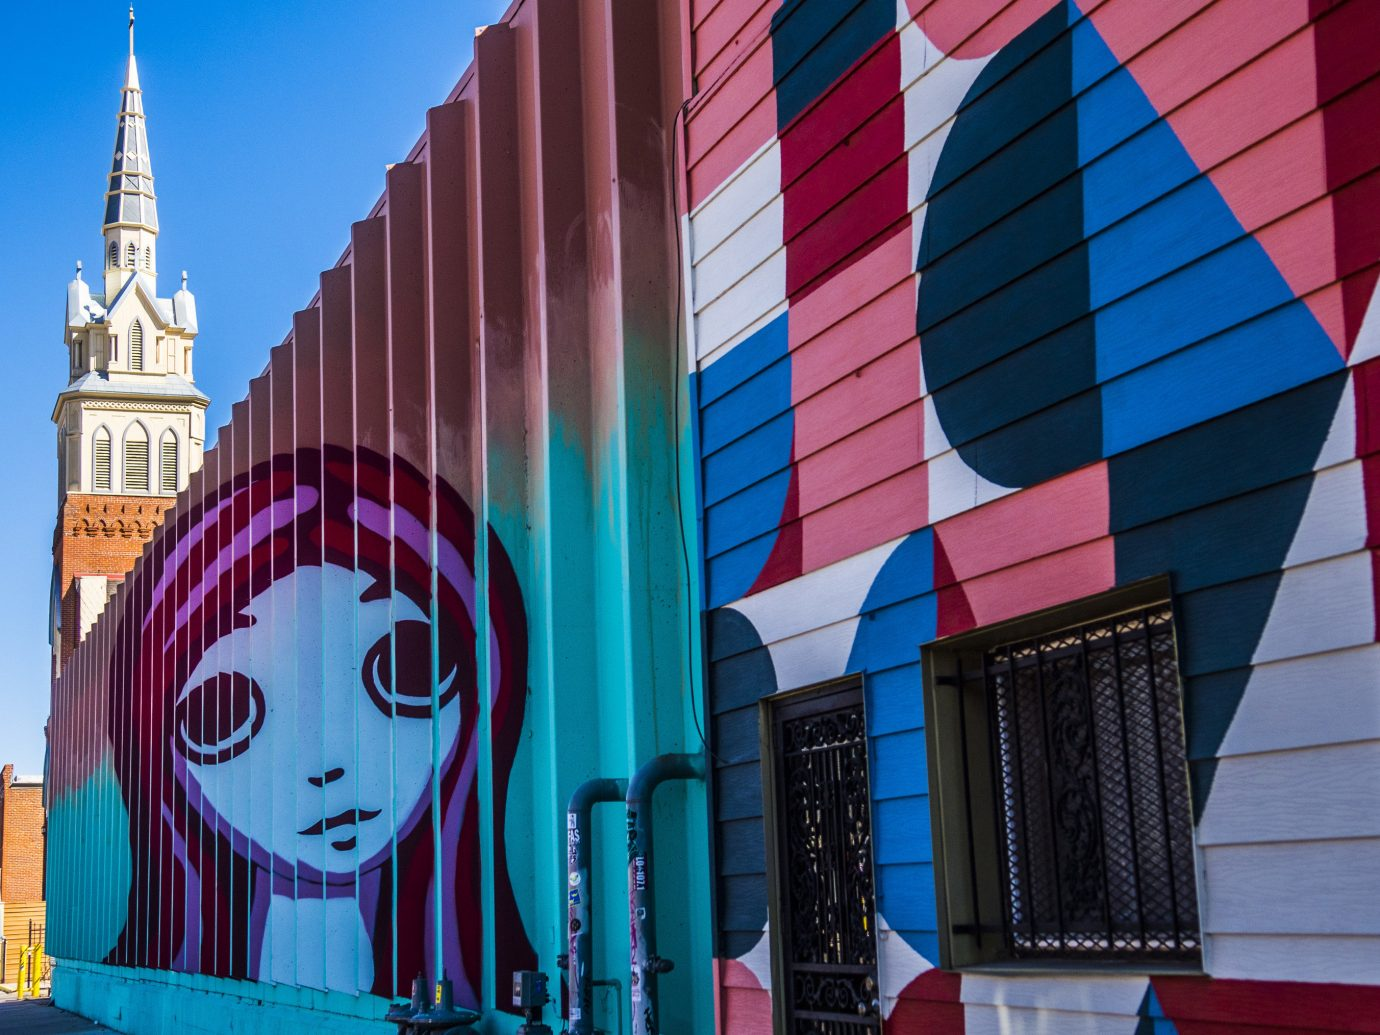 Building with graffiti in Denver, CO